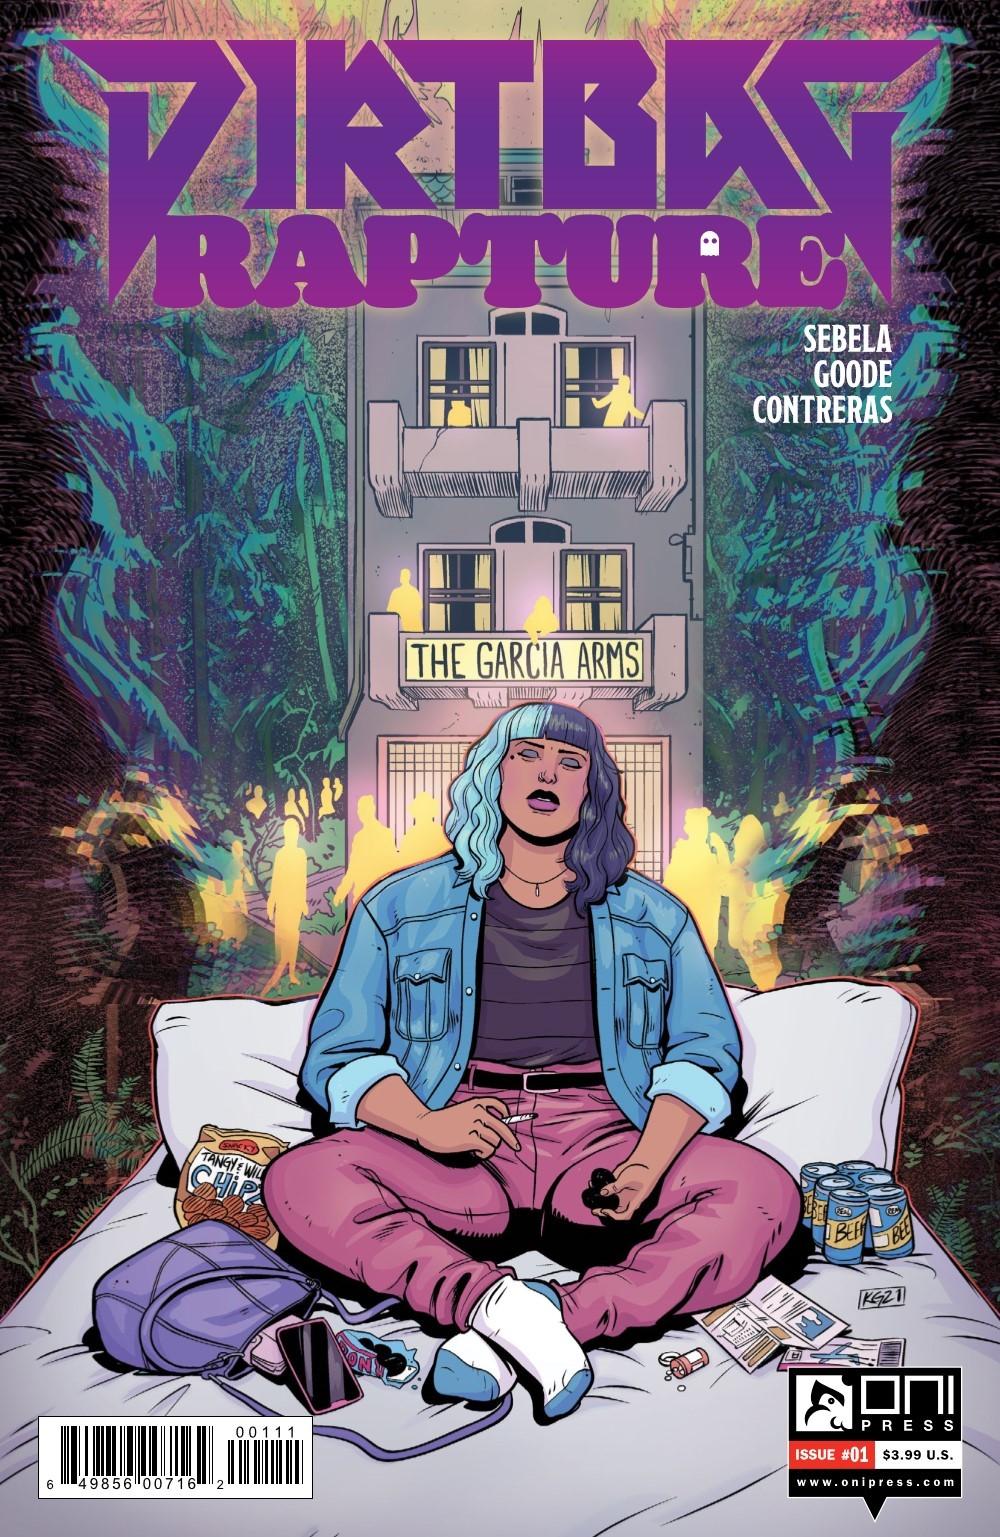 DIRTBAGRAPTURE1-MARKETING-01 ComicList Previews: DIRTBAG RAPTURE #1